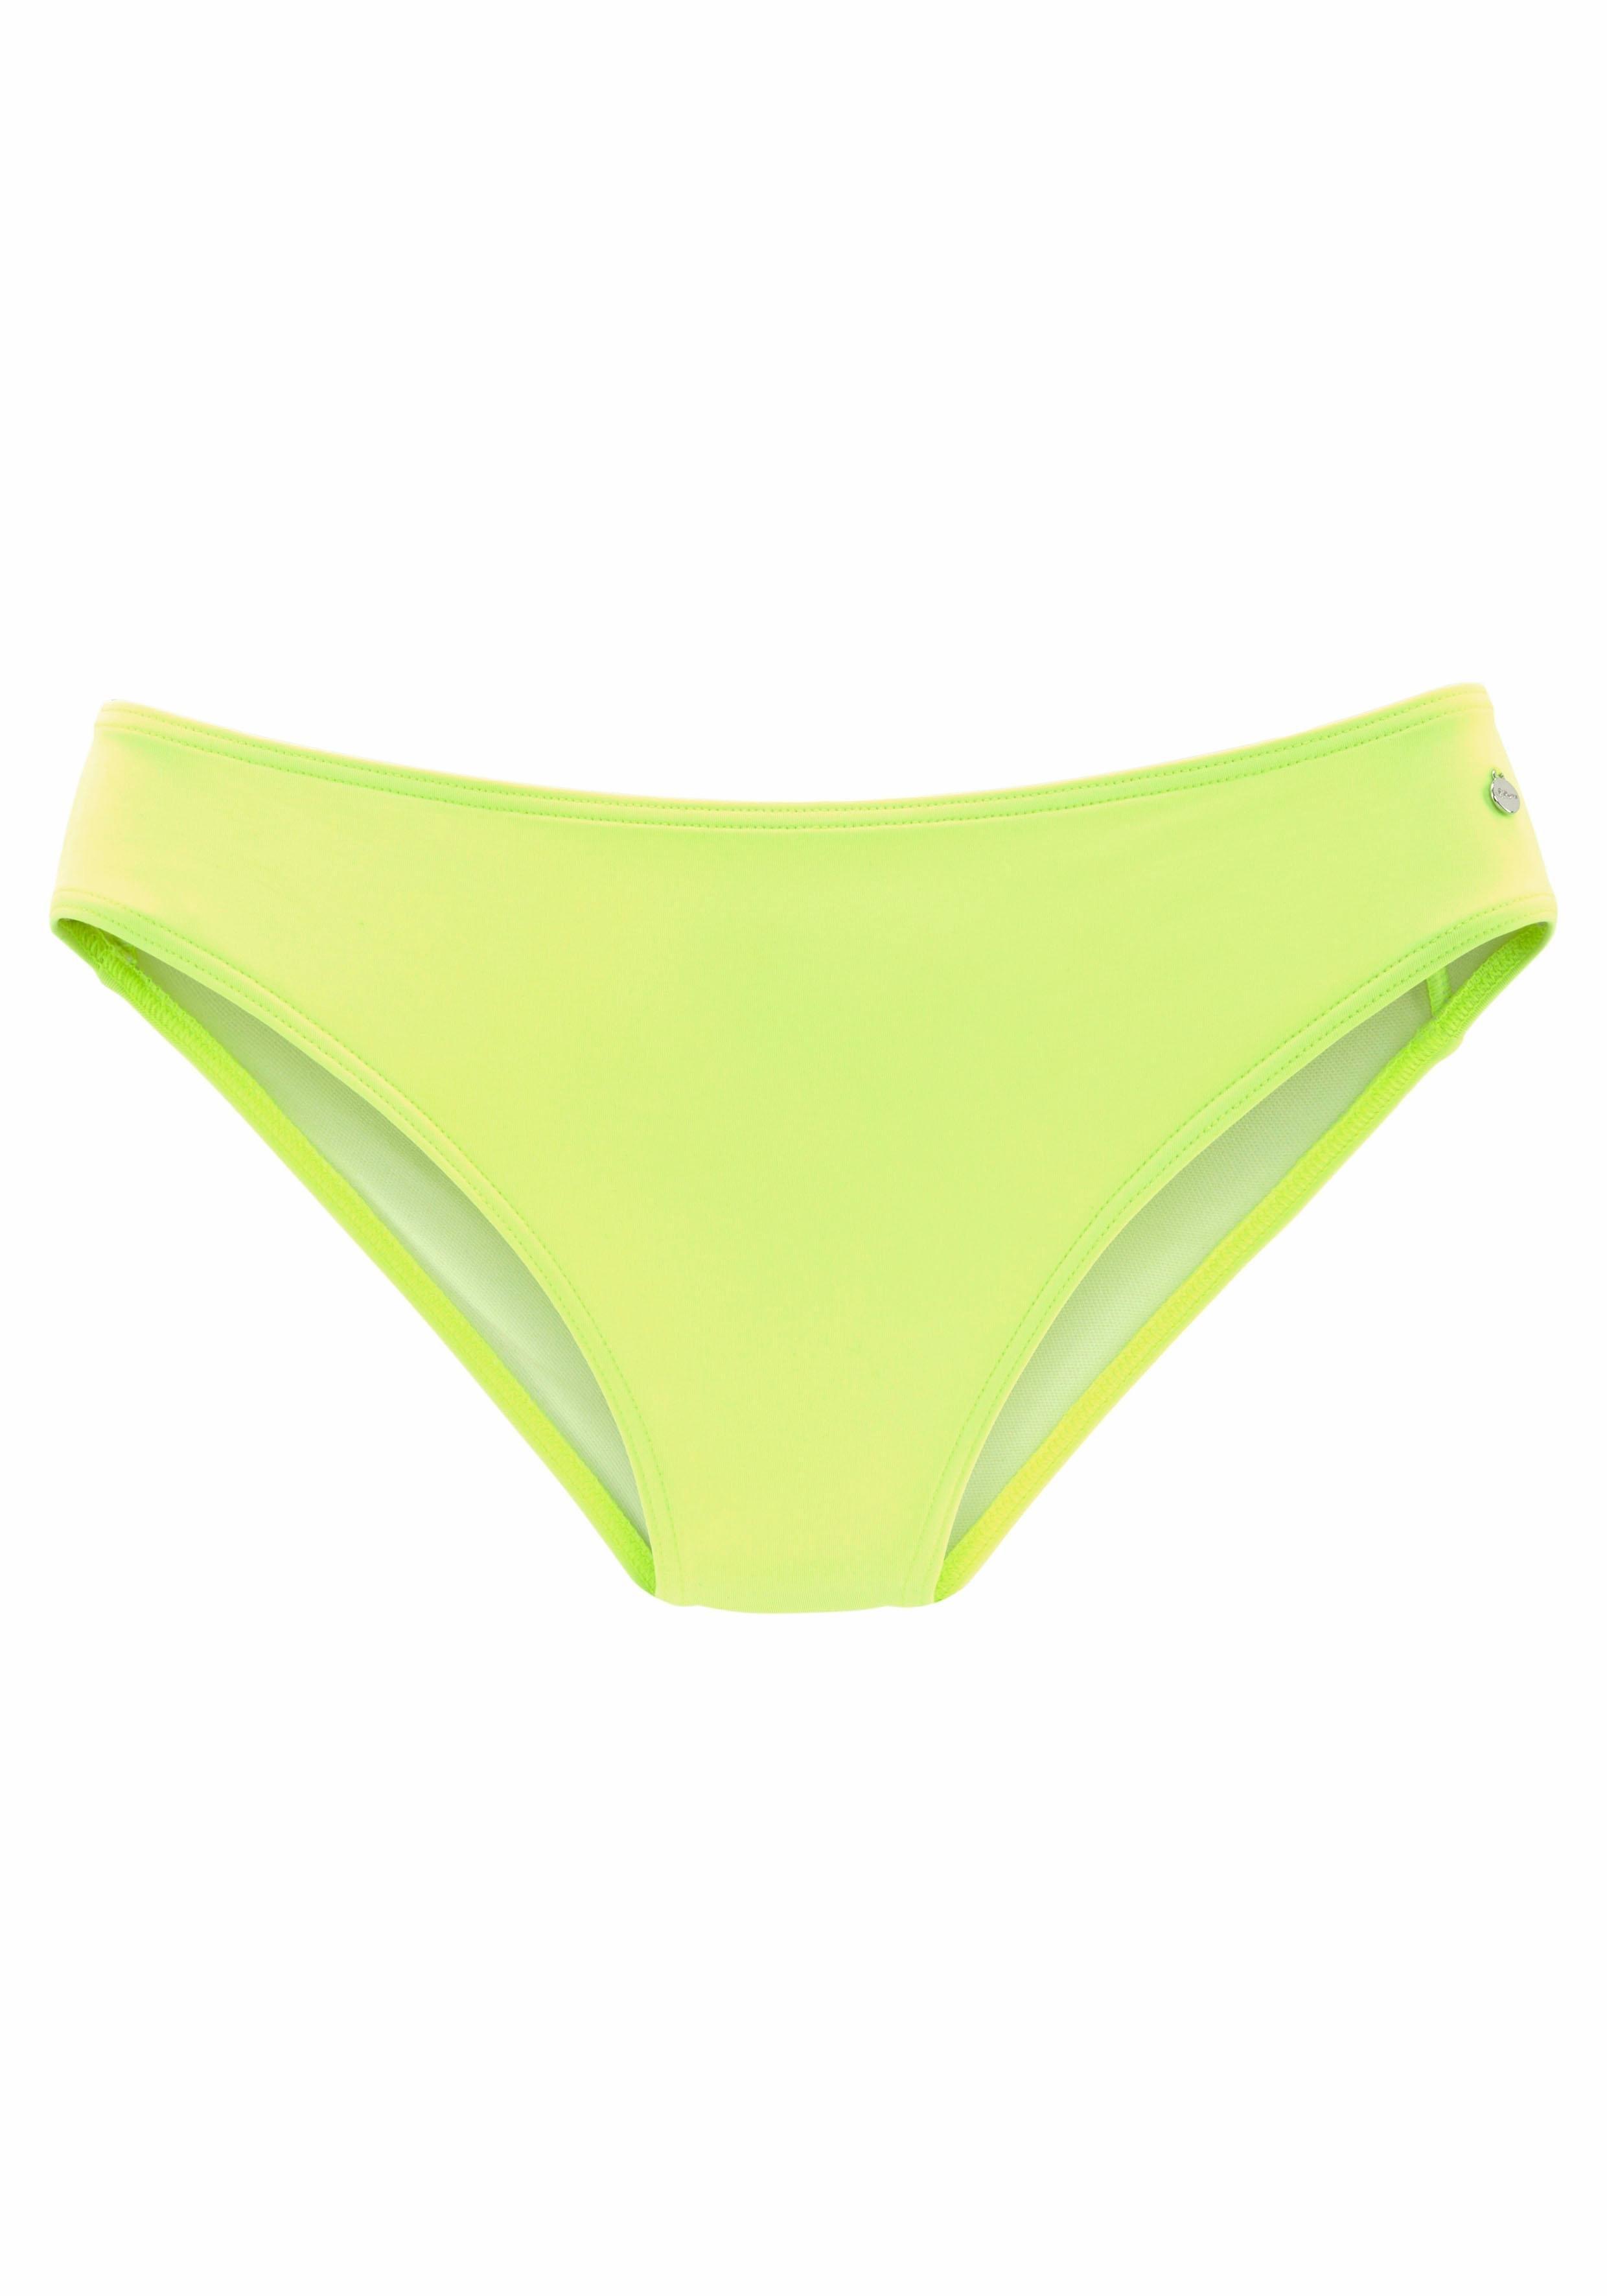 s.Oliver RED LABEL Beachwear bikinibroekje »Spain« - verschillende betaalmethodes